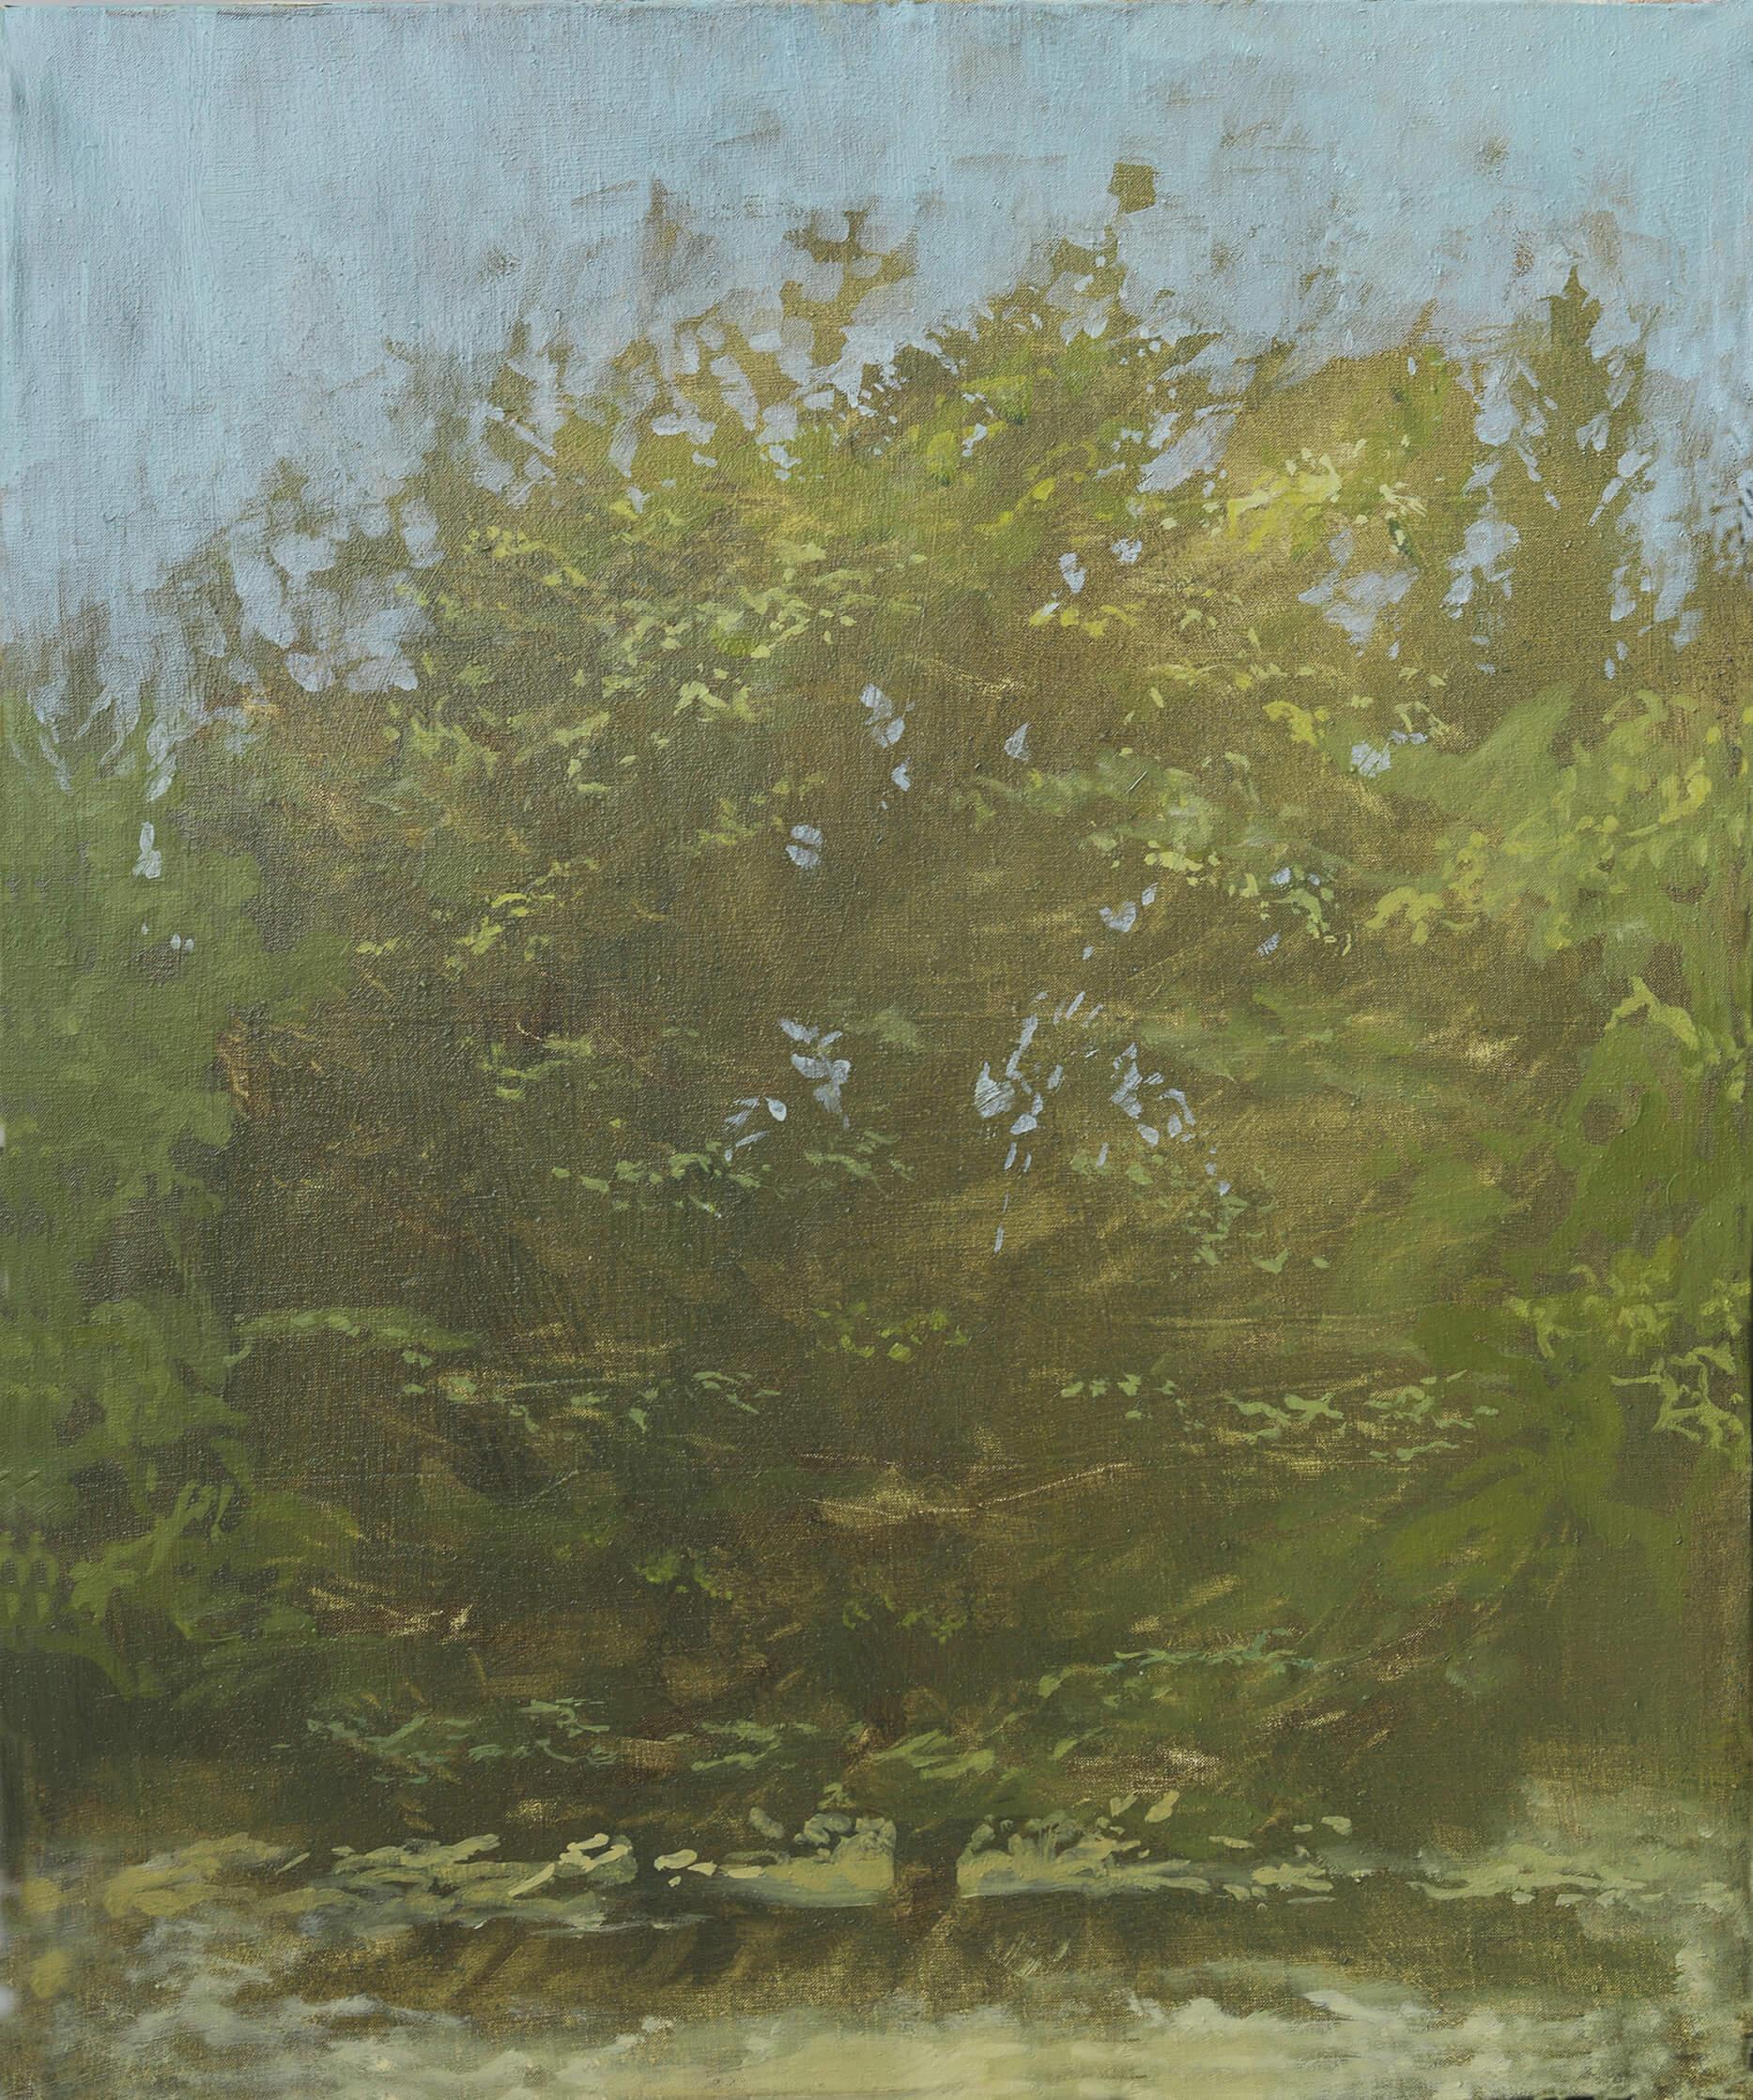 RHSK121 Summer Tree at dusk ( Oil on Linen ) 73 x 63.5 cm